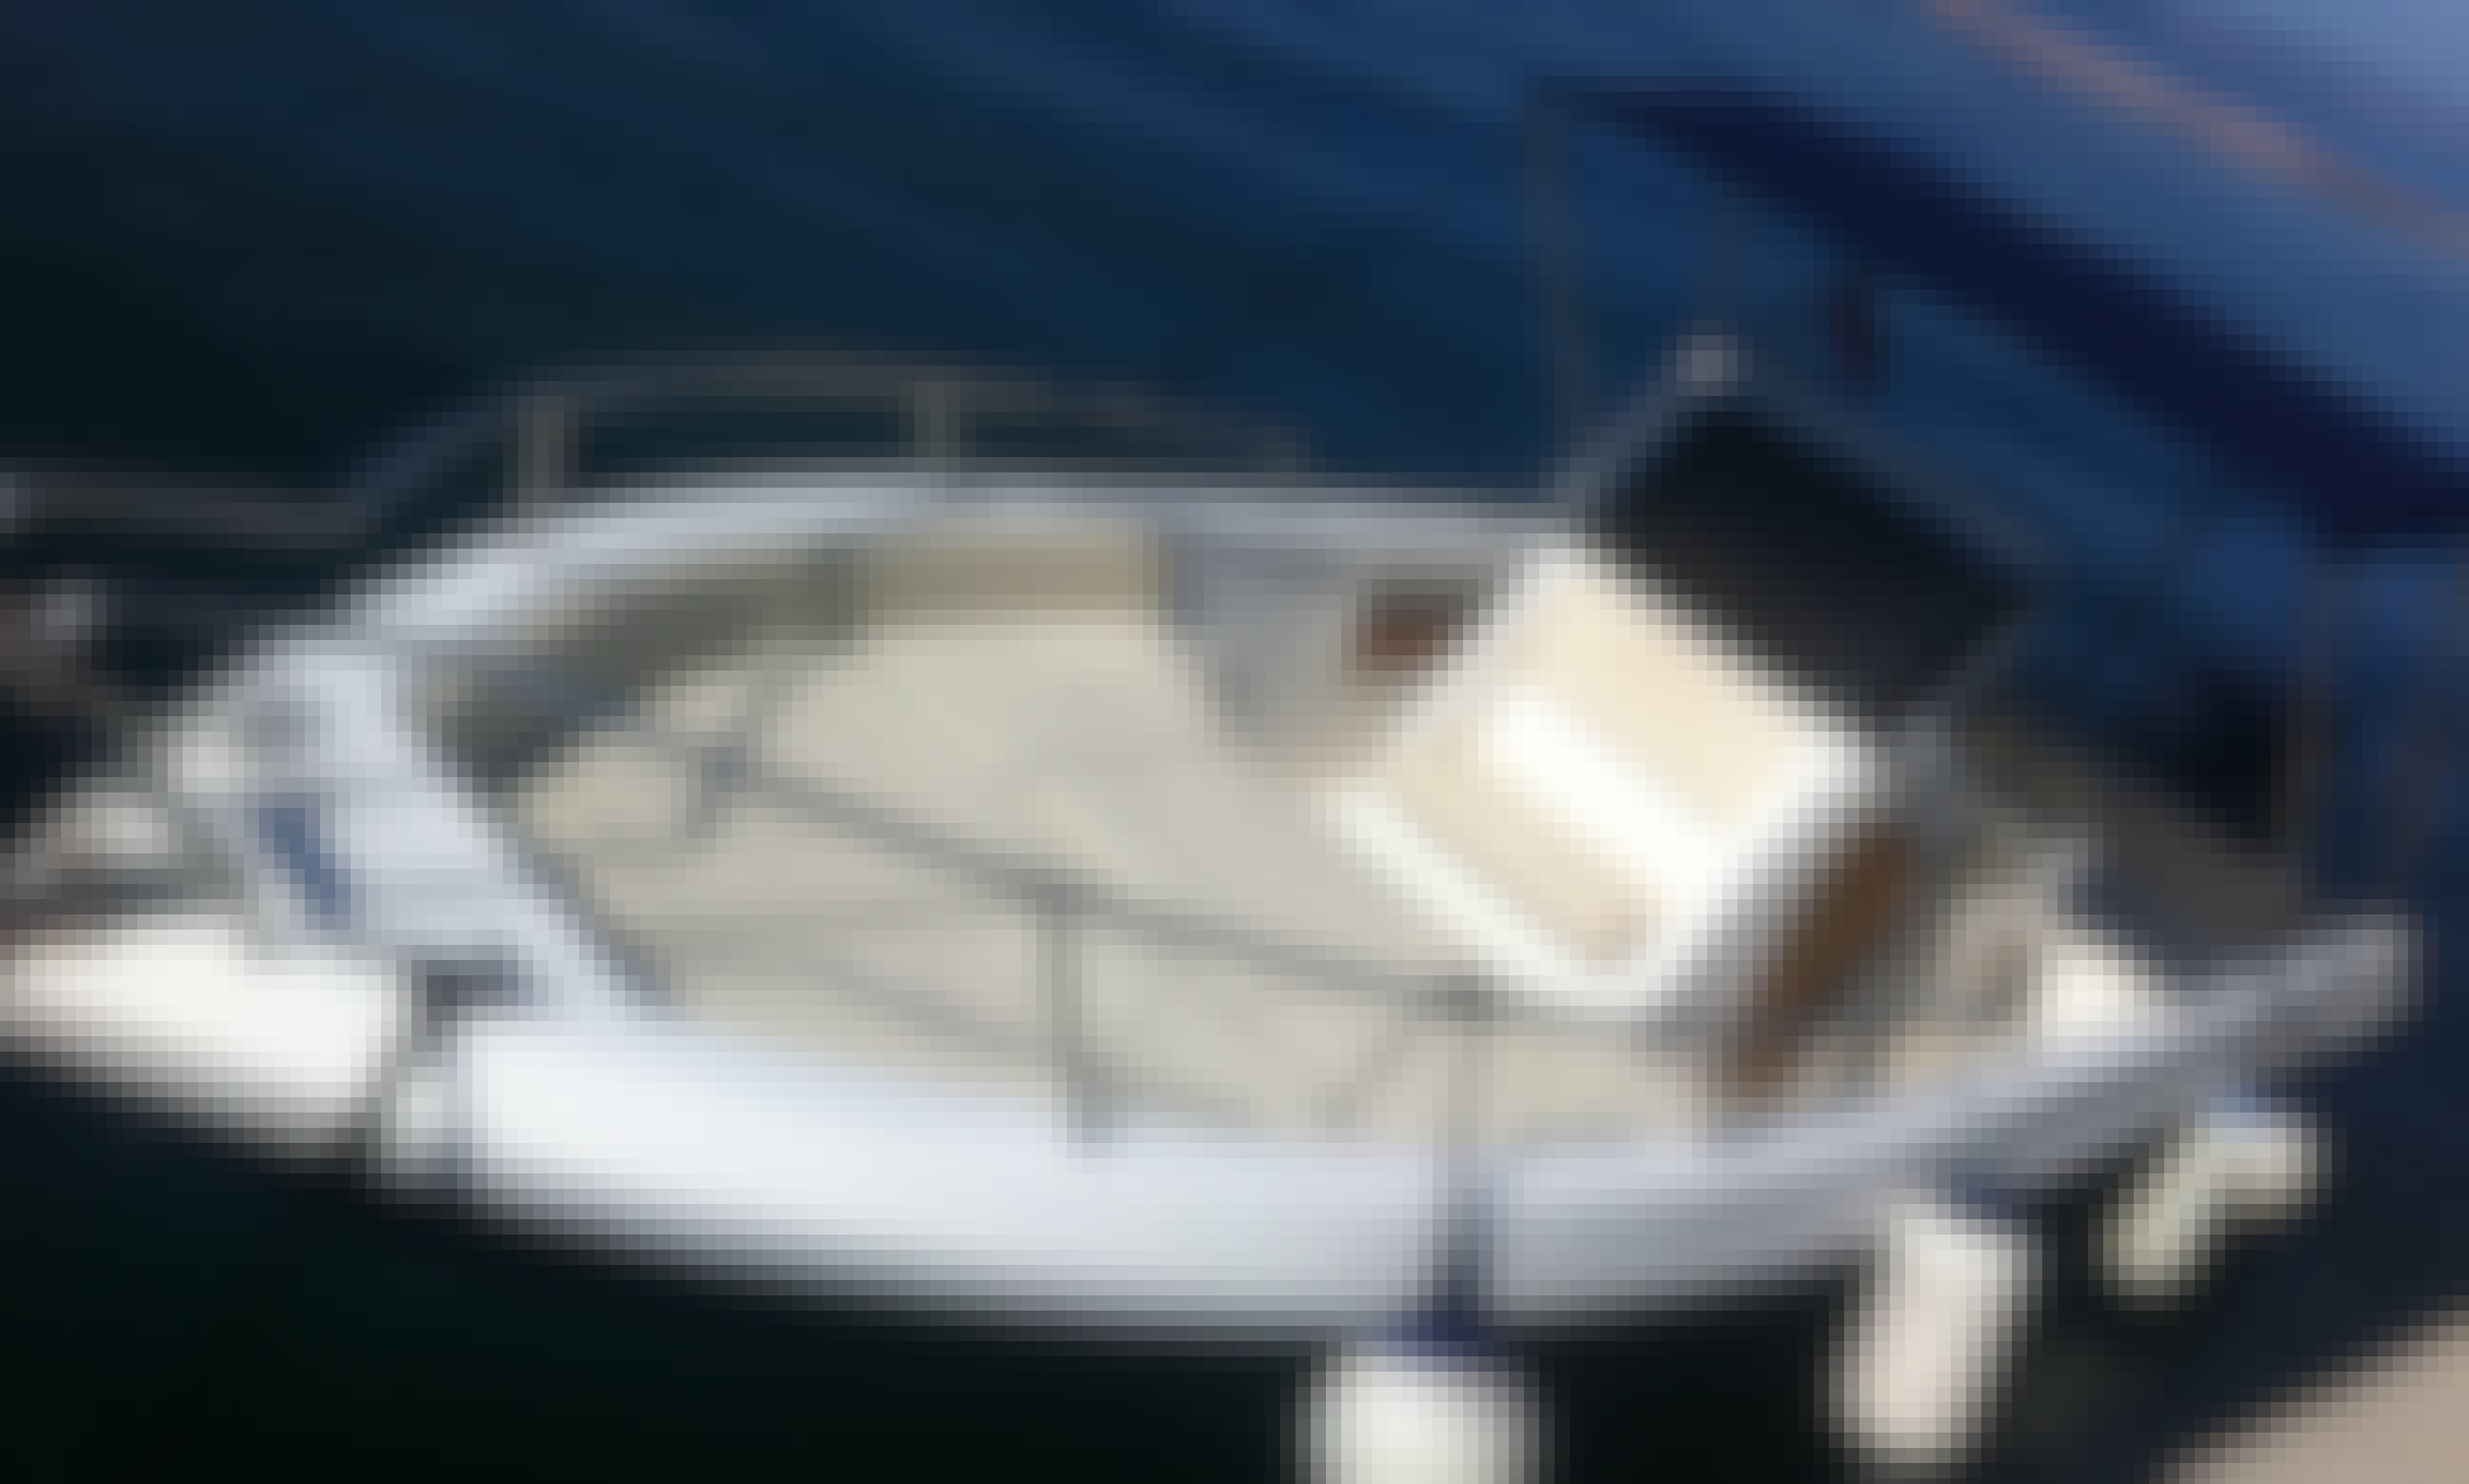 Center Console Boat for Rent in Portorož